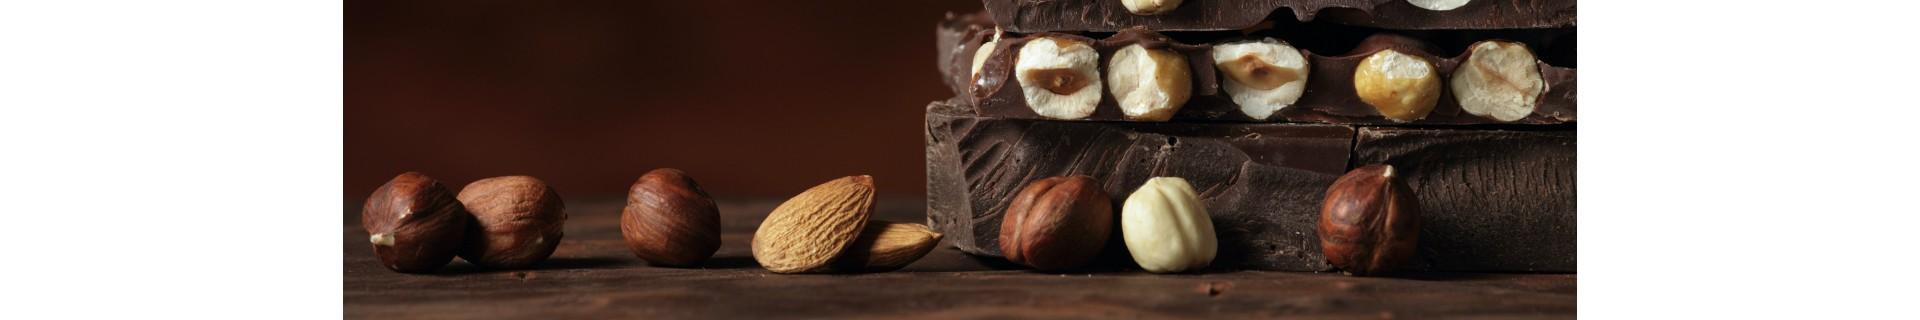 Chocolate artesanal y Confituras | Conservas Hondarribia